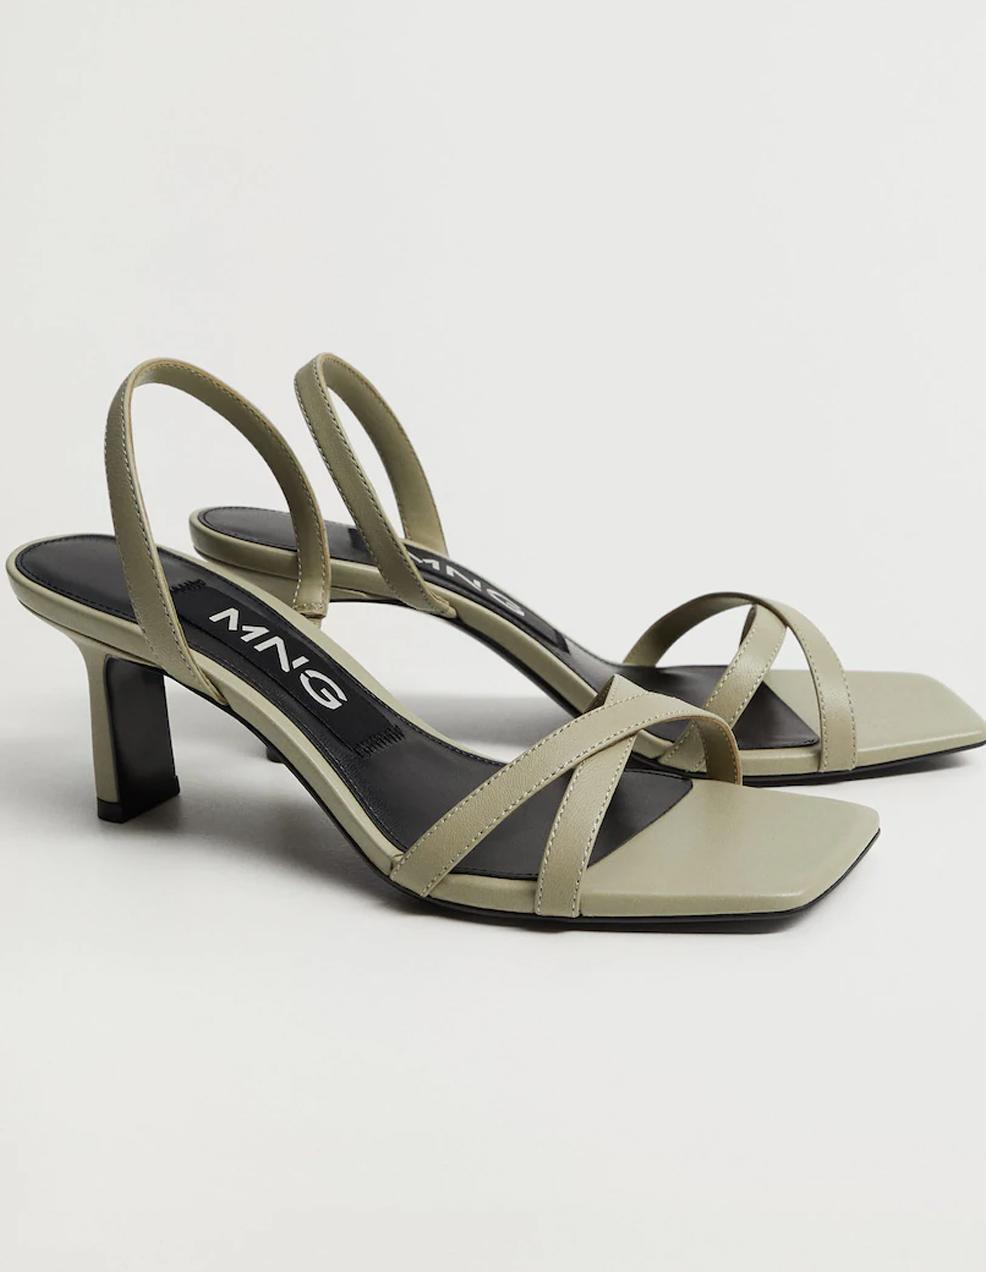 khaki heeled sandals